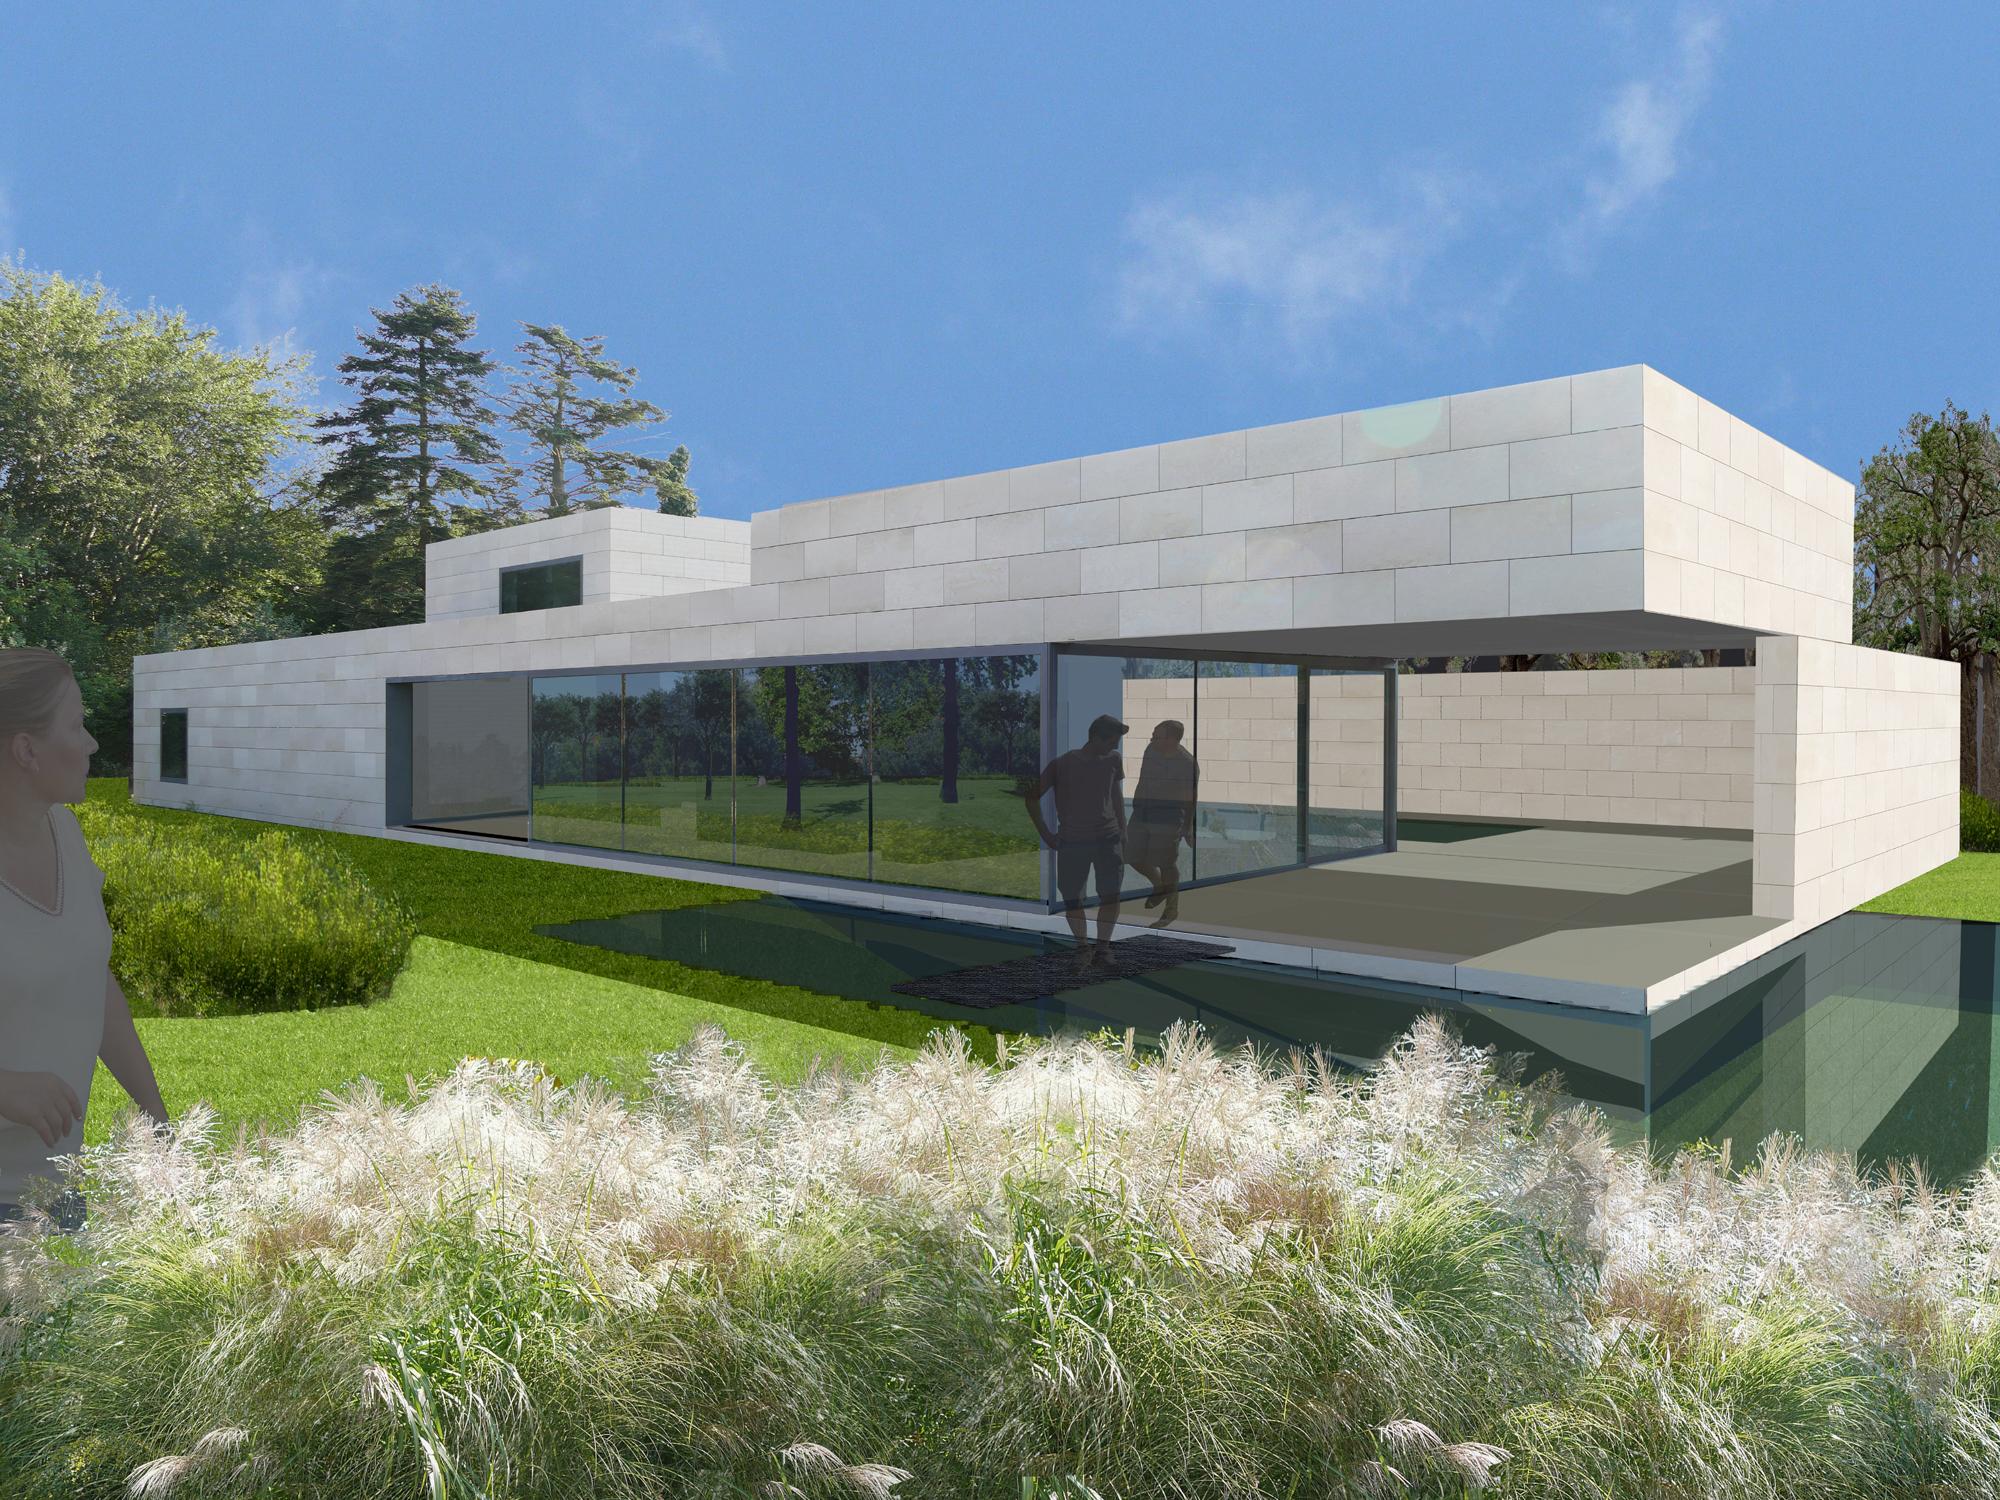 Kabinet pepijn verheyen tuinarchitectuur kabinet for Tuinarchitect modern